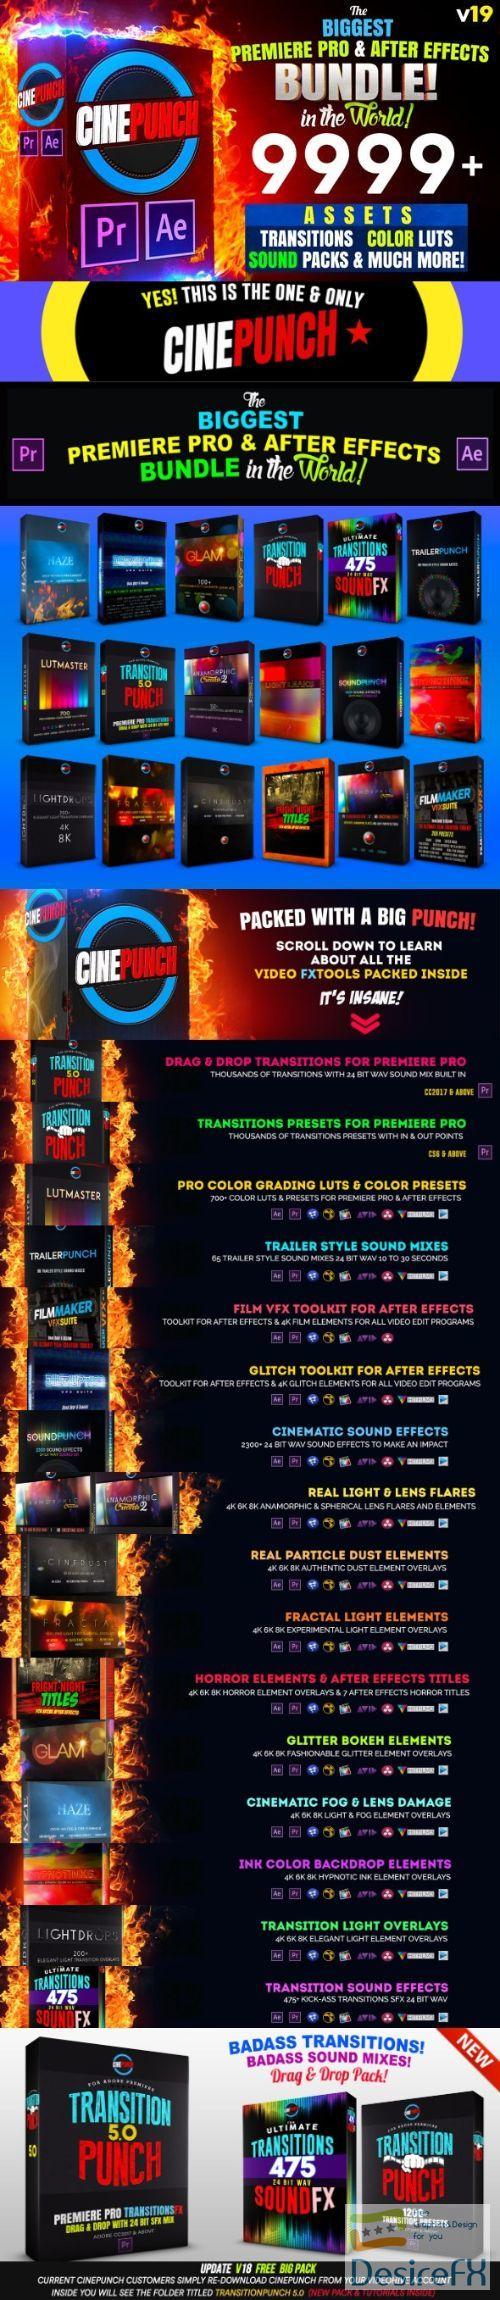 Videohive CINEPUNCH (BUNDLE) - Premiere Pro Transitions I Color LUTs I SFX - 18 PACKS - 9999+ Assets V19